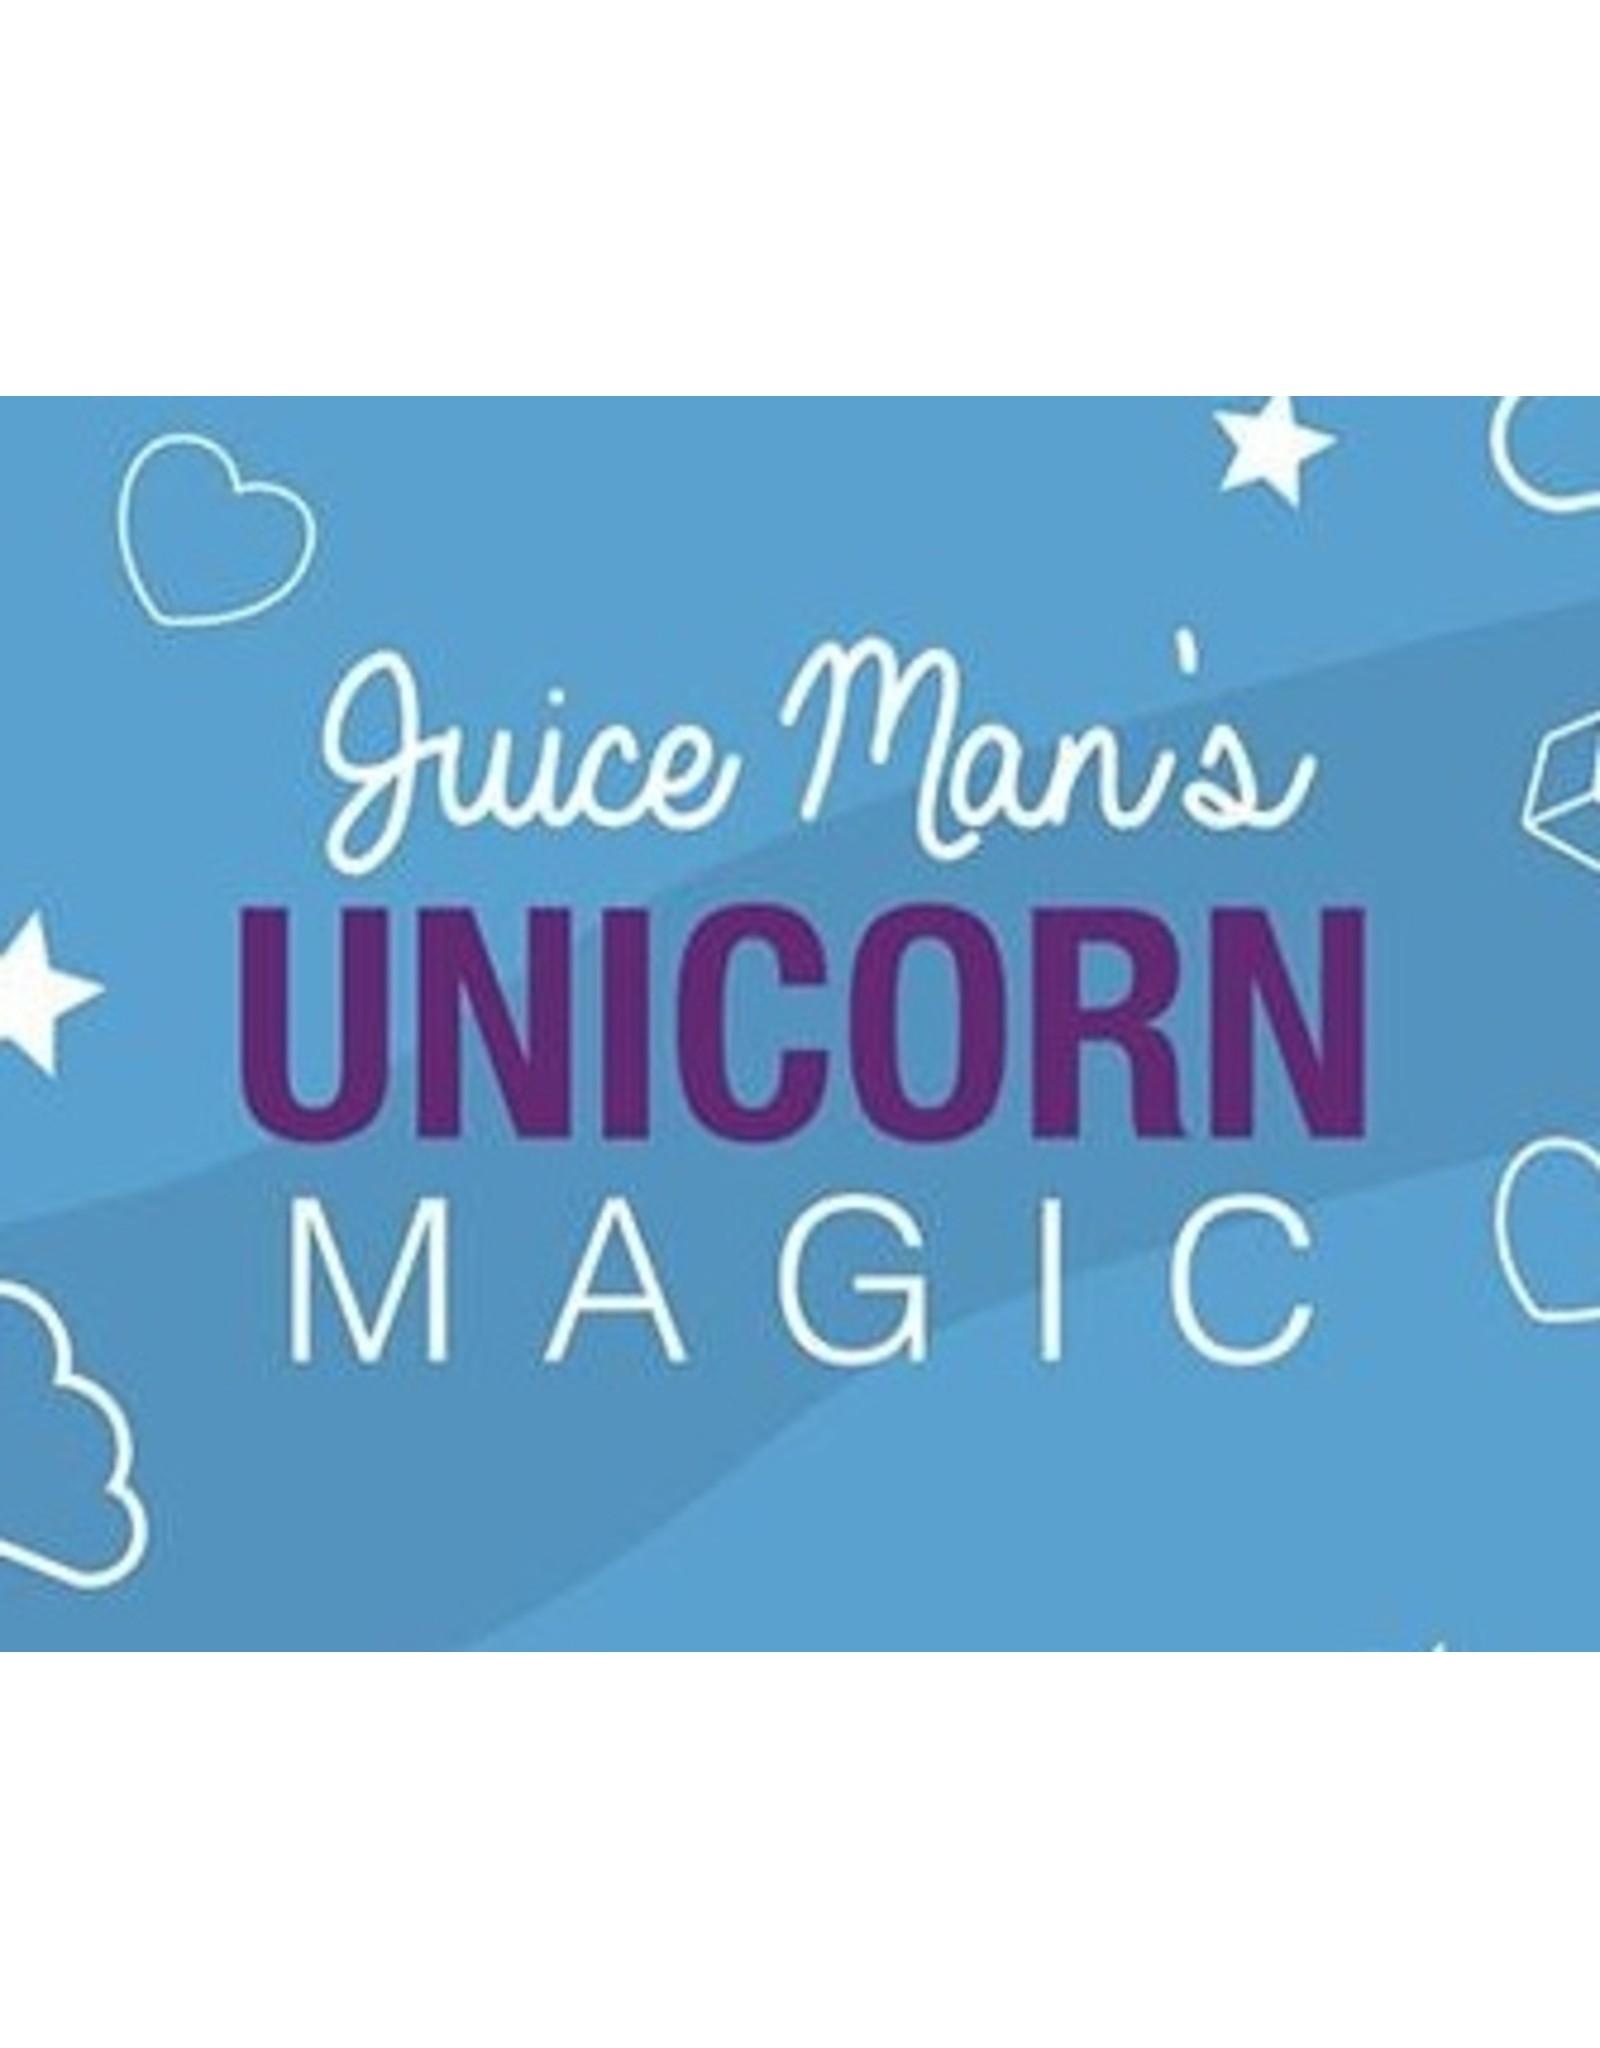 Unicorn Magic Unicorn Magic